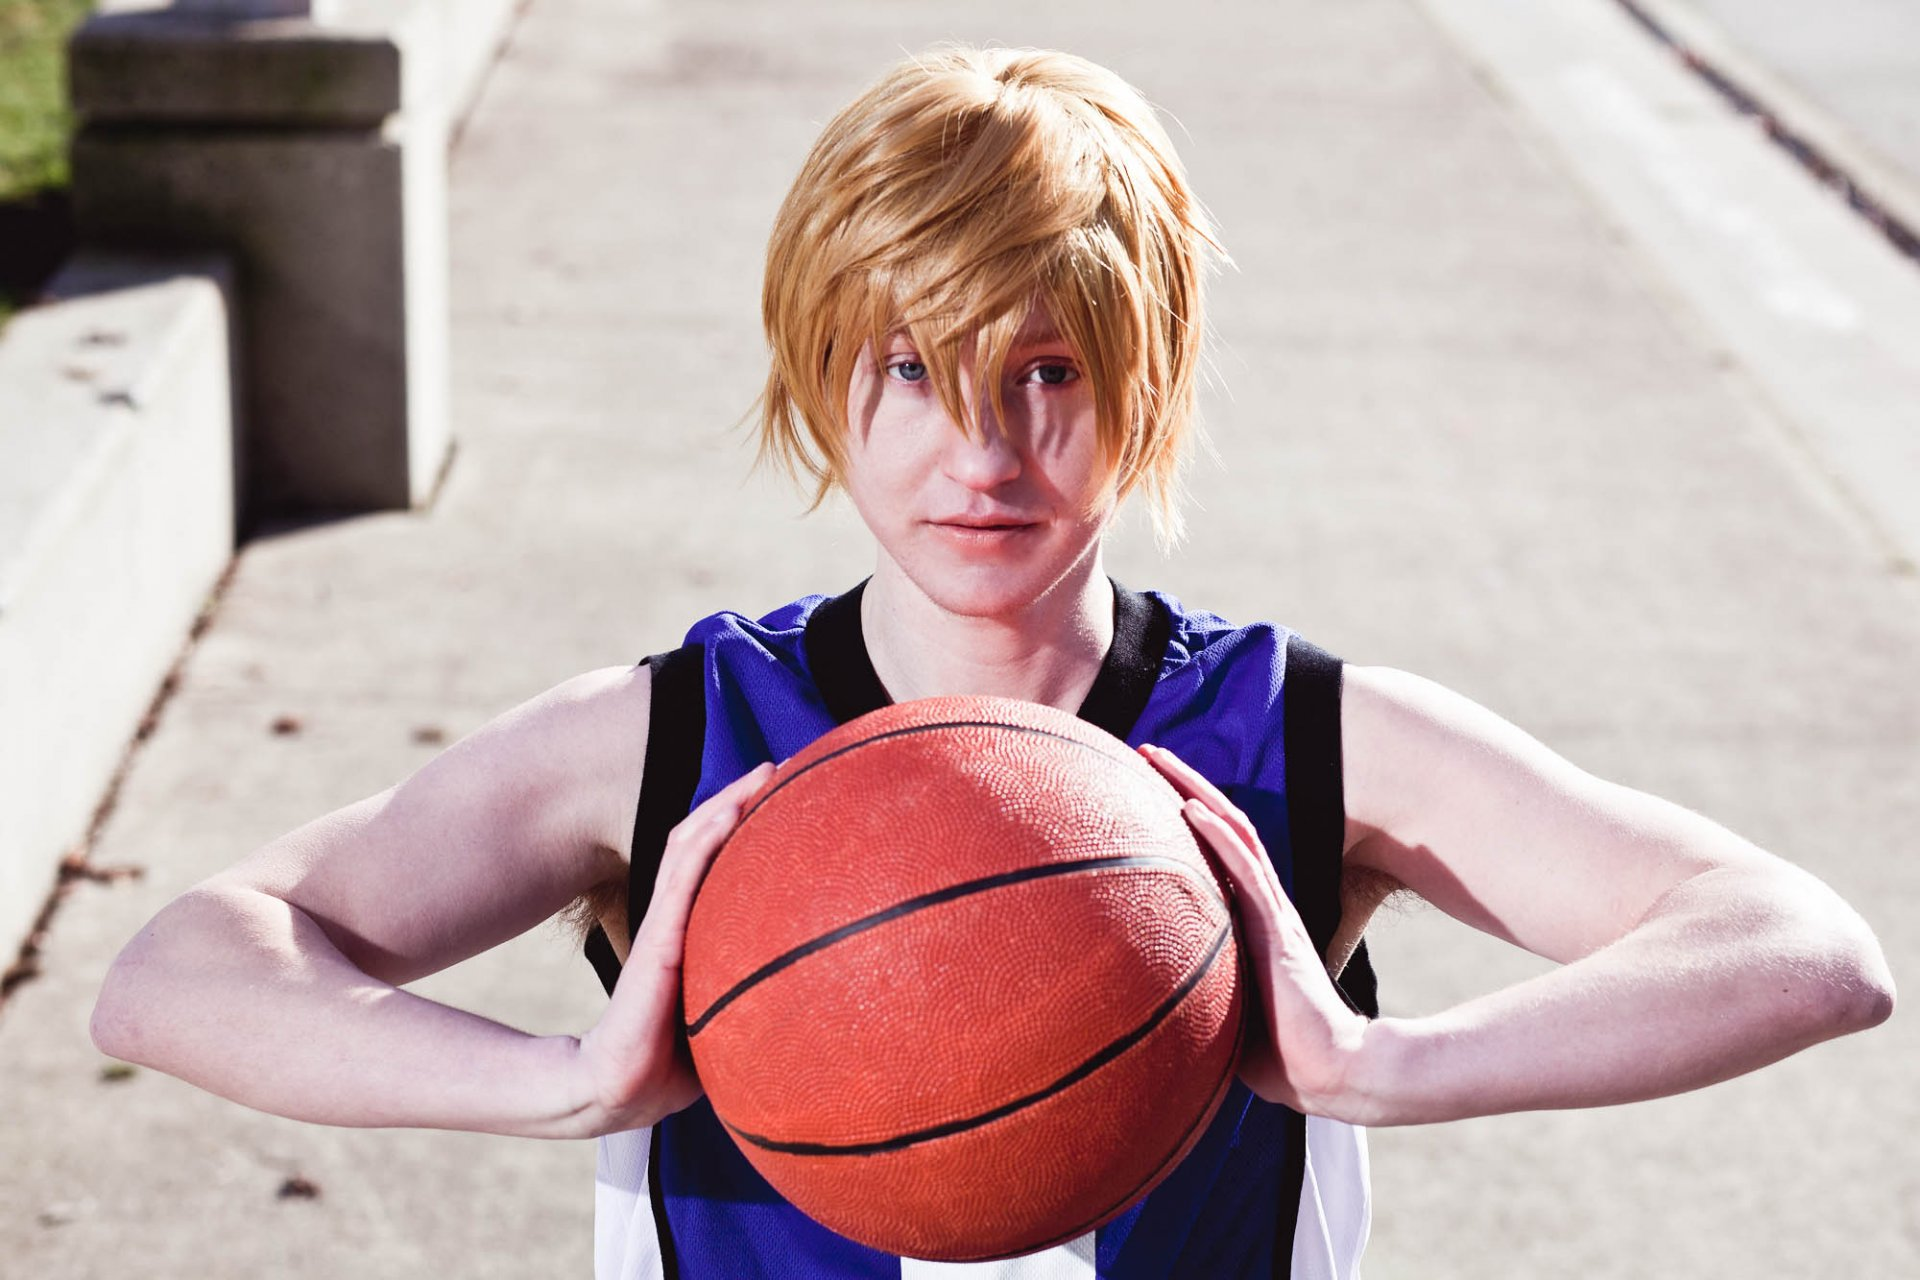 москве, картинки парень на баскетболе начале